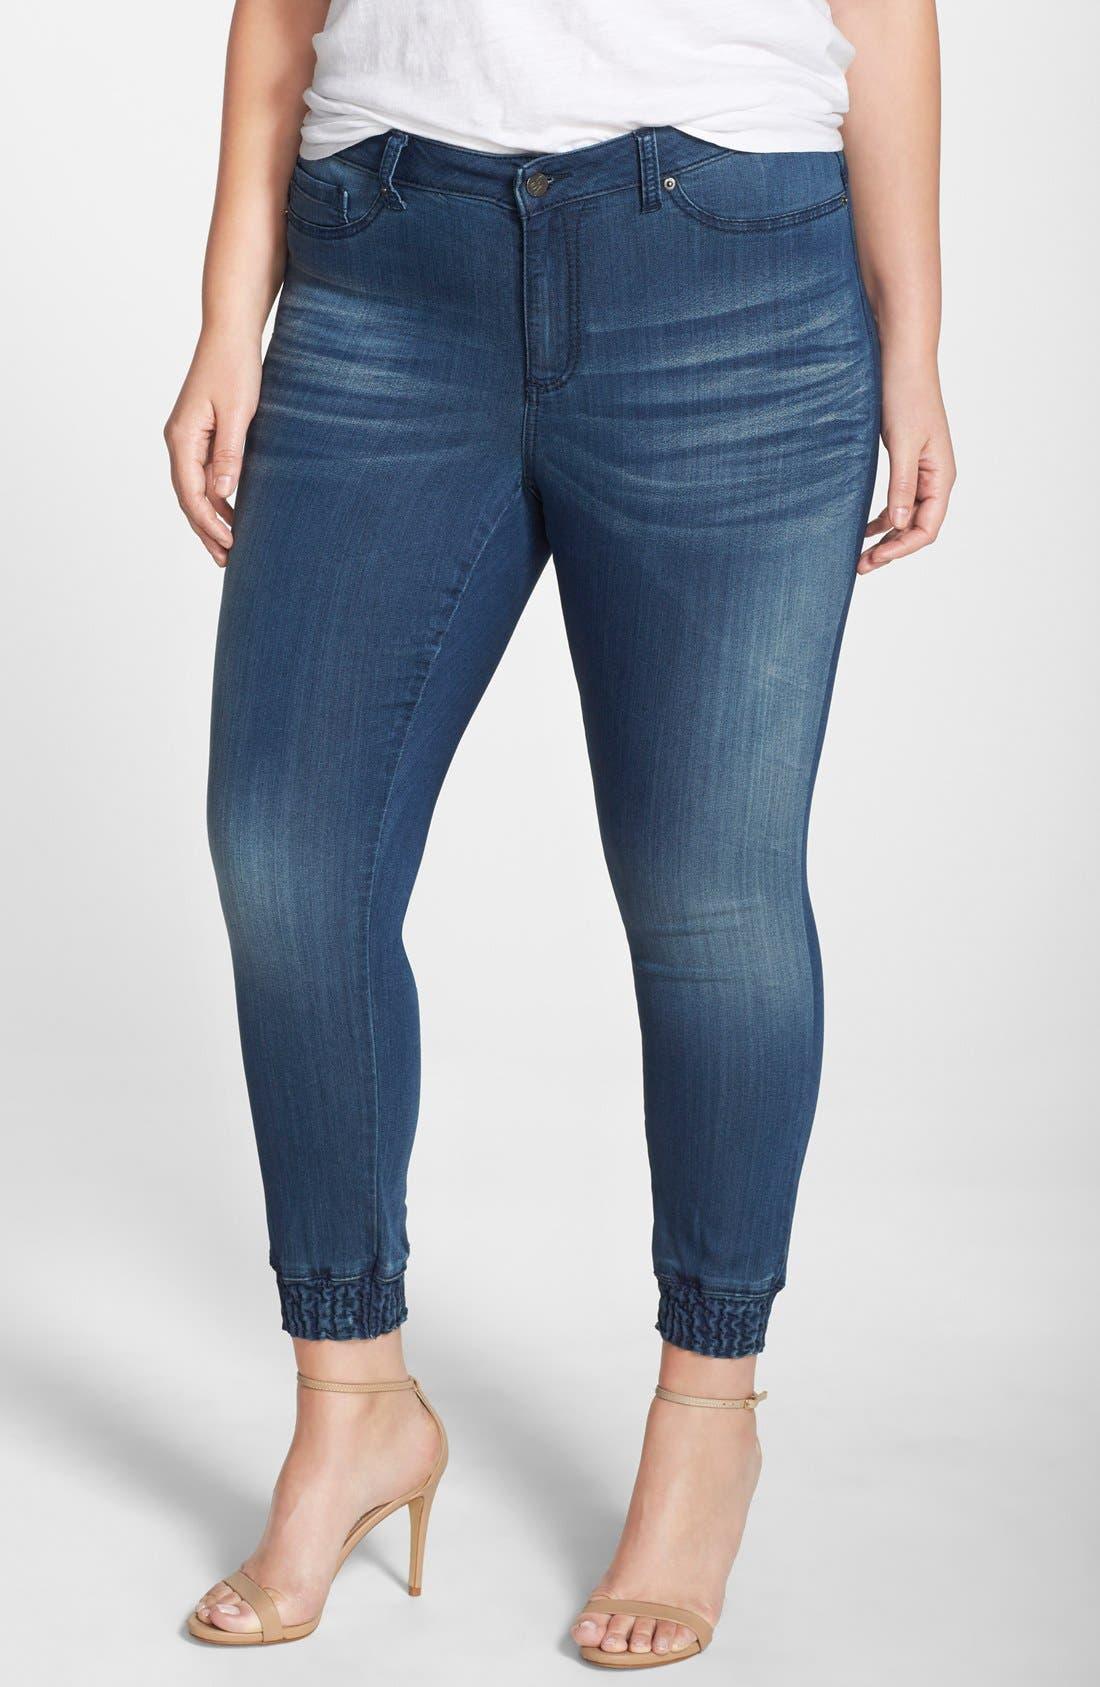 'Suzzie' Stretch Knit Denim Crop Jeans,                         Main,                         color, DARK BLUE